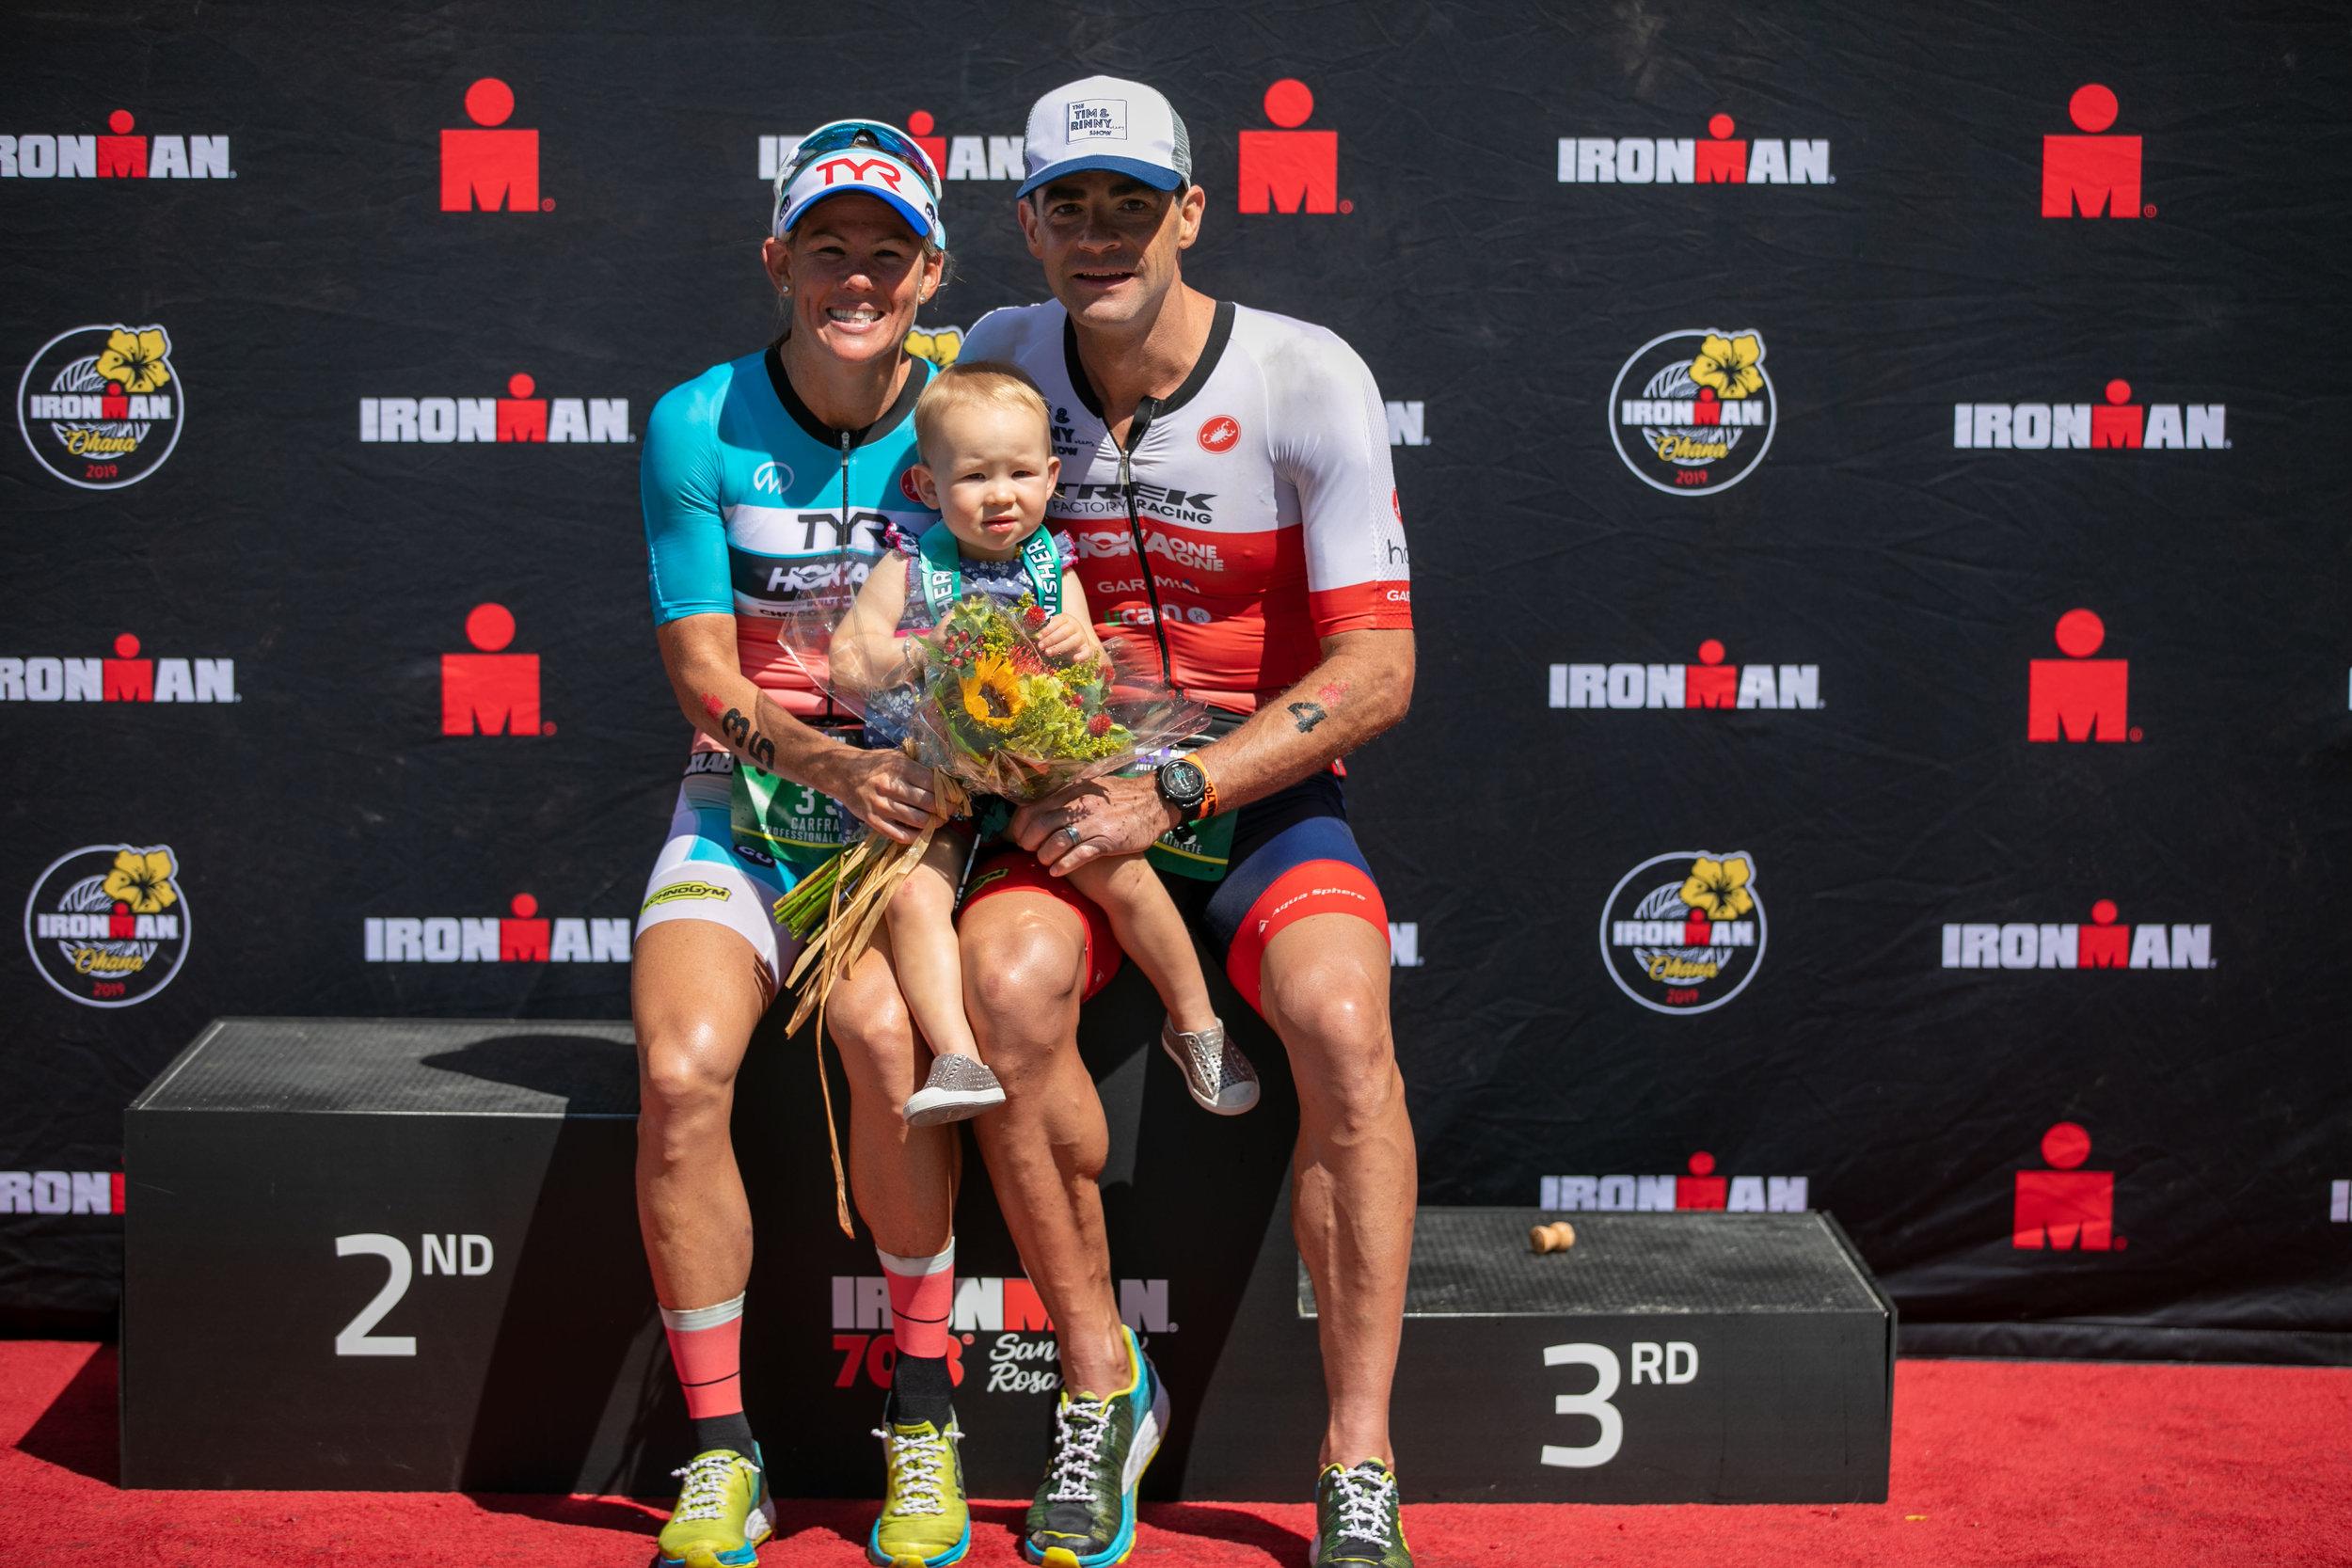 Ironman 70.3 Santa Rosa -